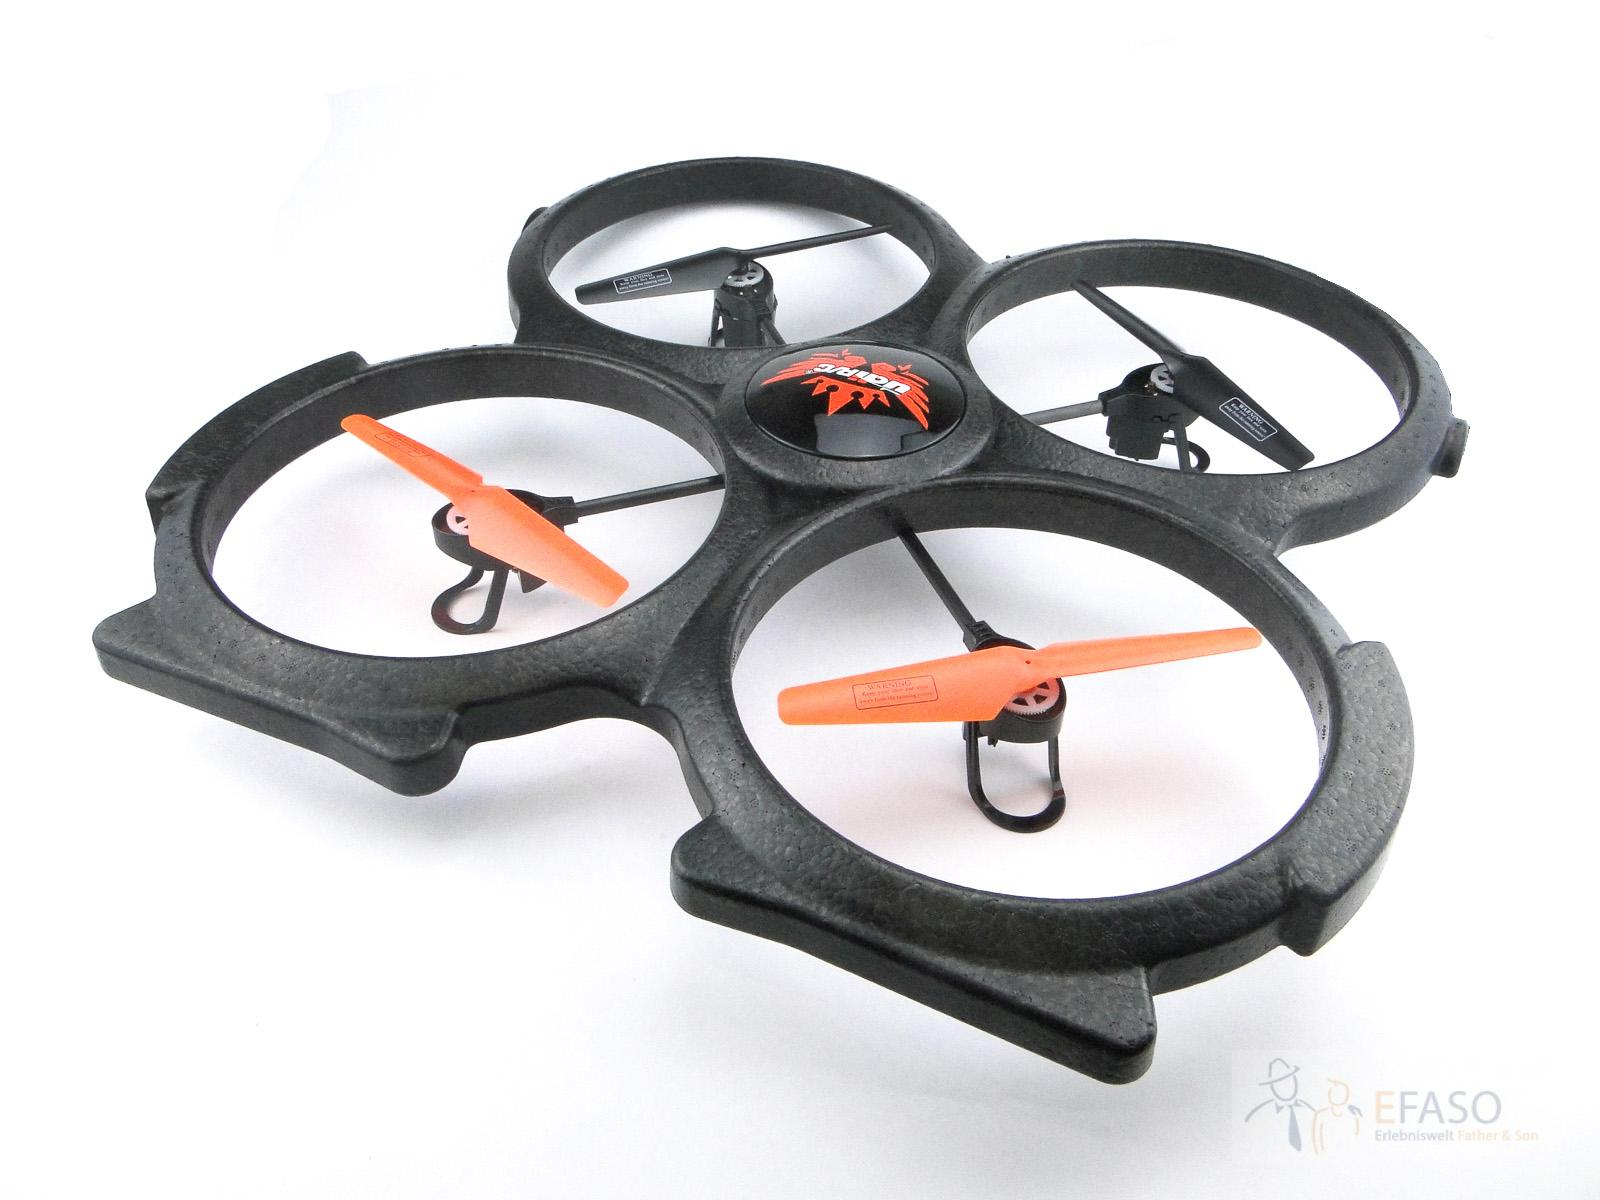 UDI U829A RC Quadcopter, 2,4 GHz, Modell 2015 mit Kamera ...